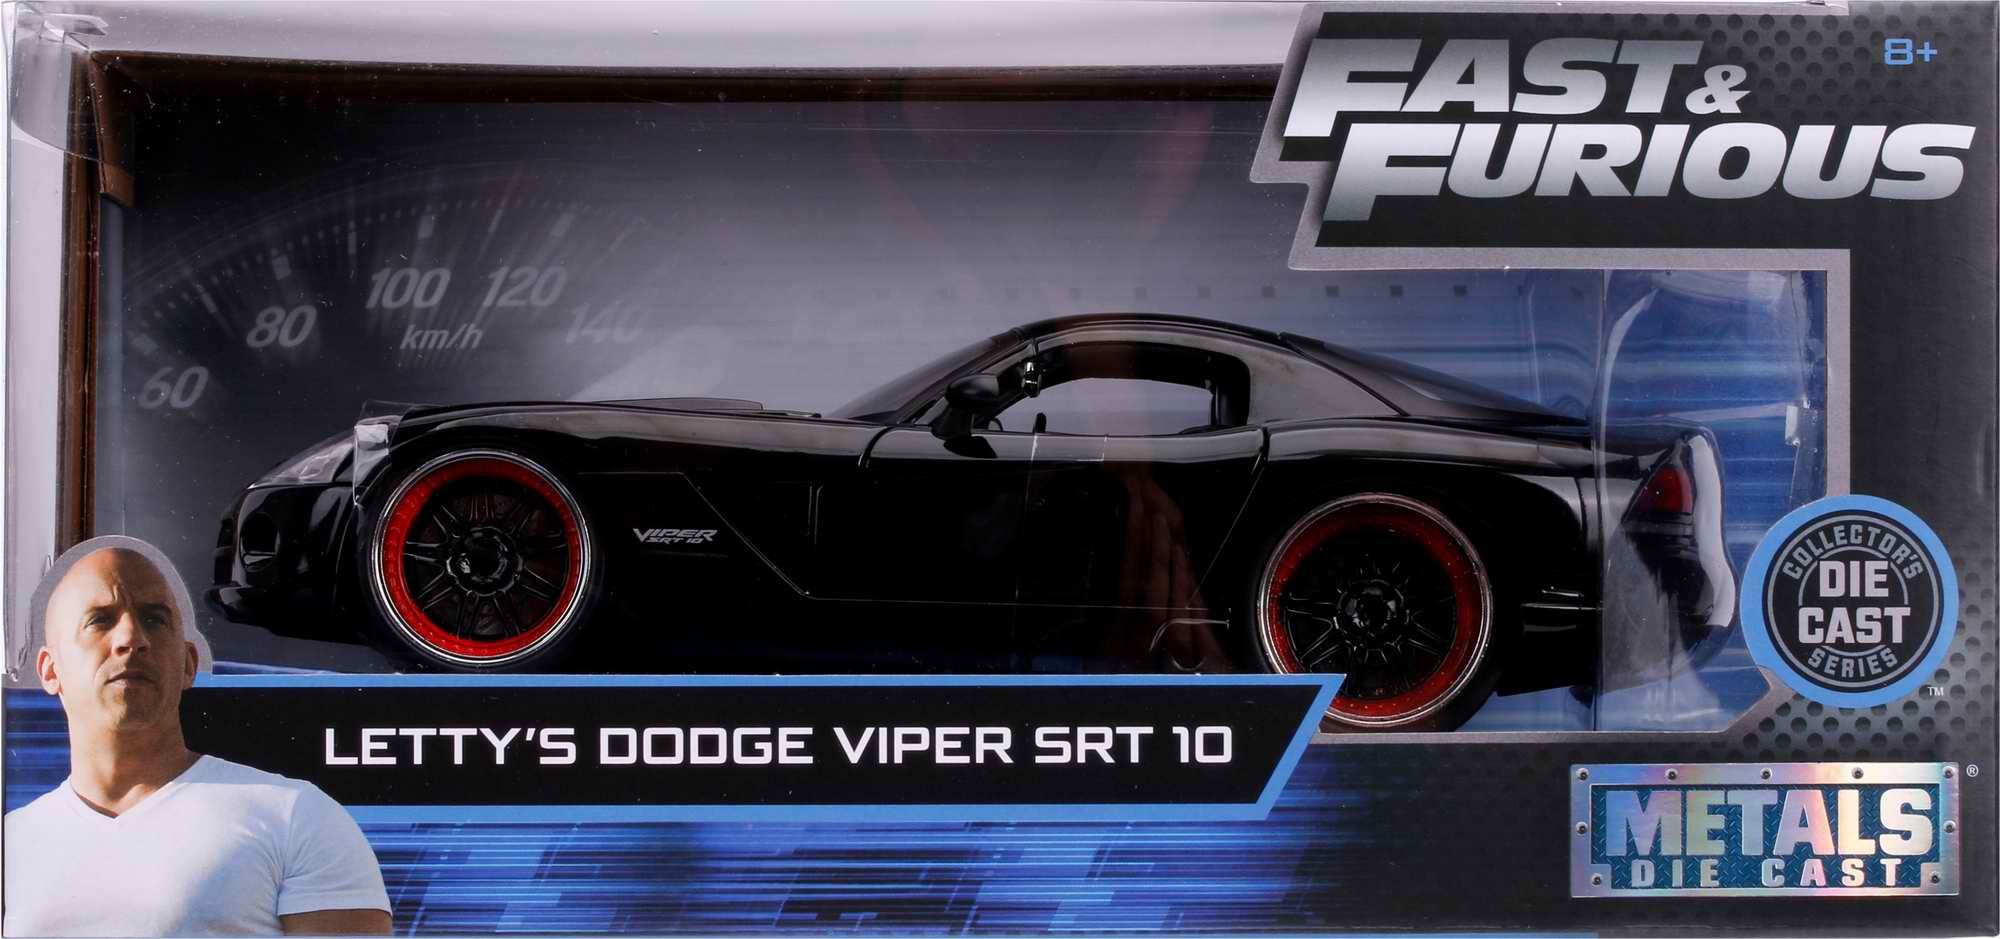 DODGE VIPER SRT-10 2003 FAST AND FURIOUS 7 LETTY 1/24 Voiture de Collection au 1/24